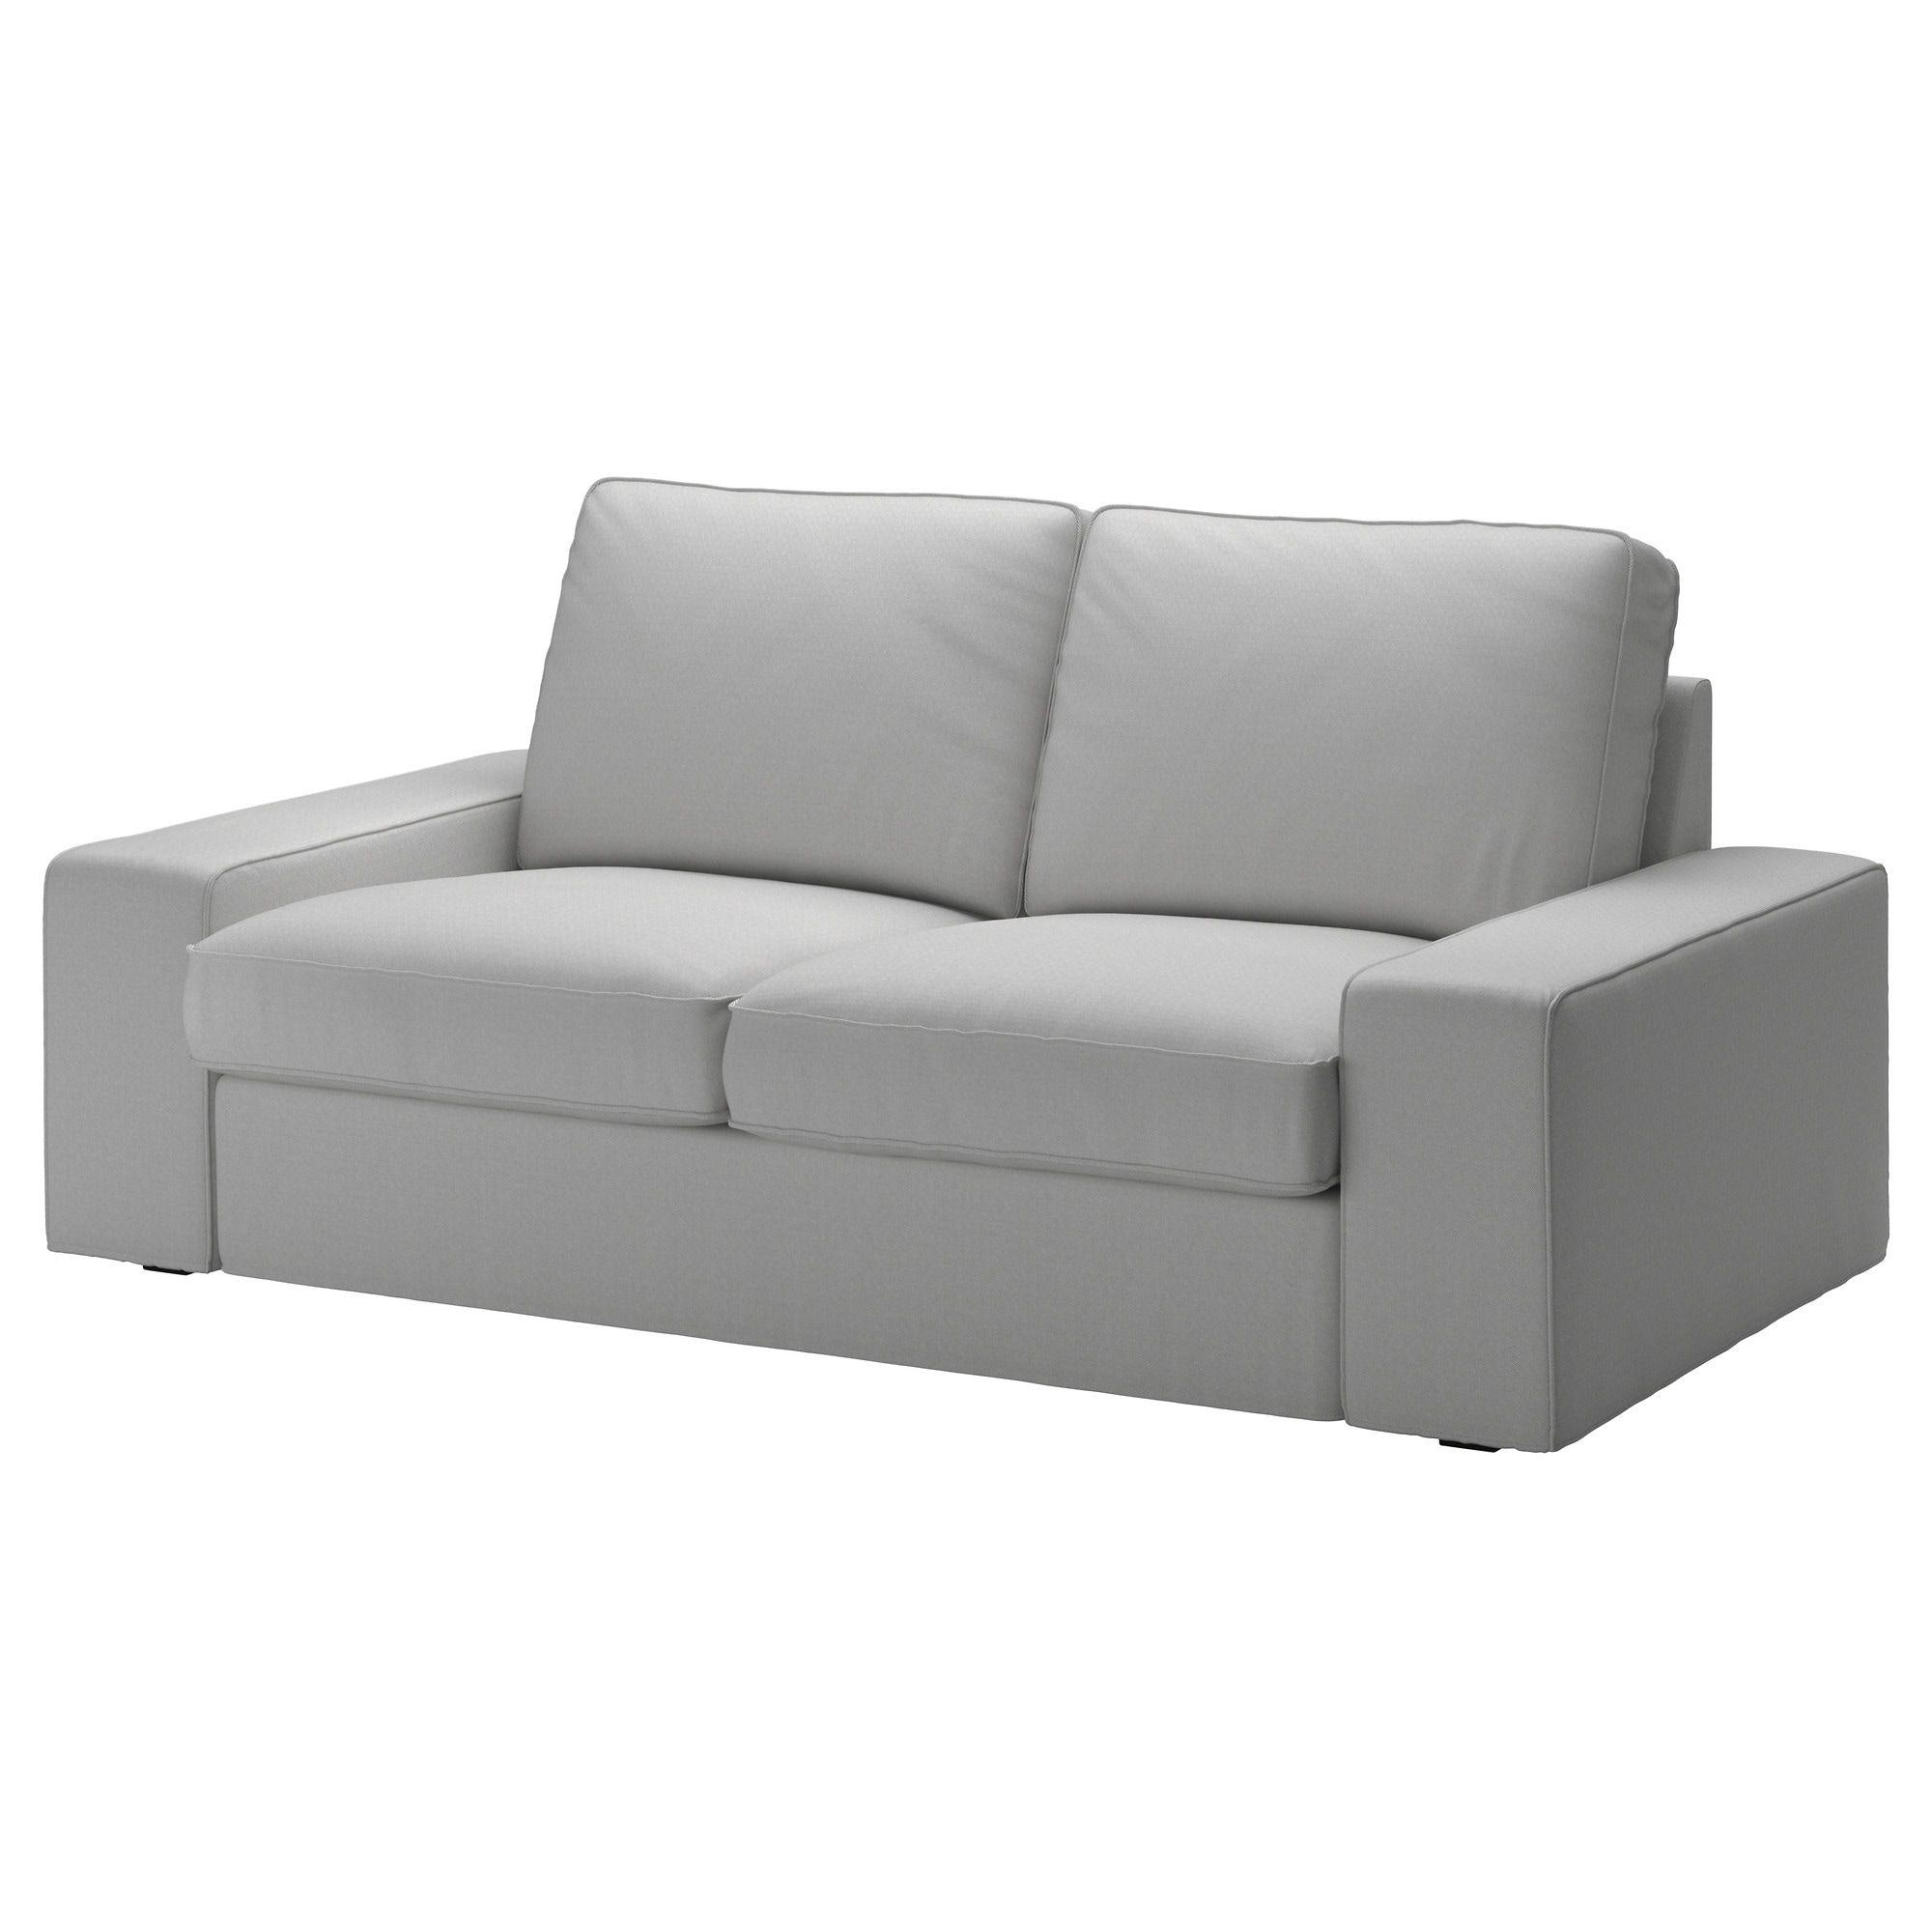 Canapé Ikea Convertible 2 Places kivik loveseat cover - orrsta light gray   ikea sofa